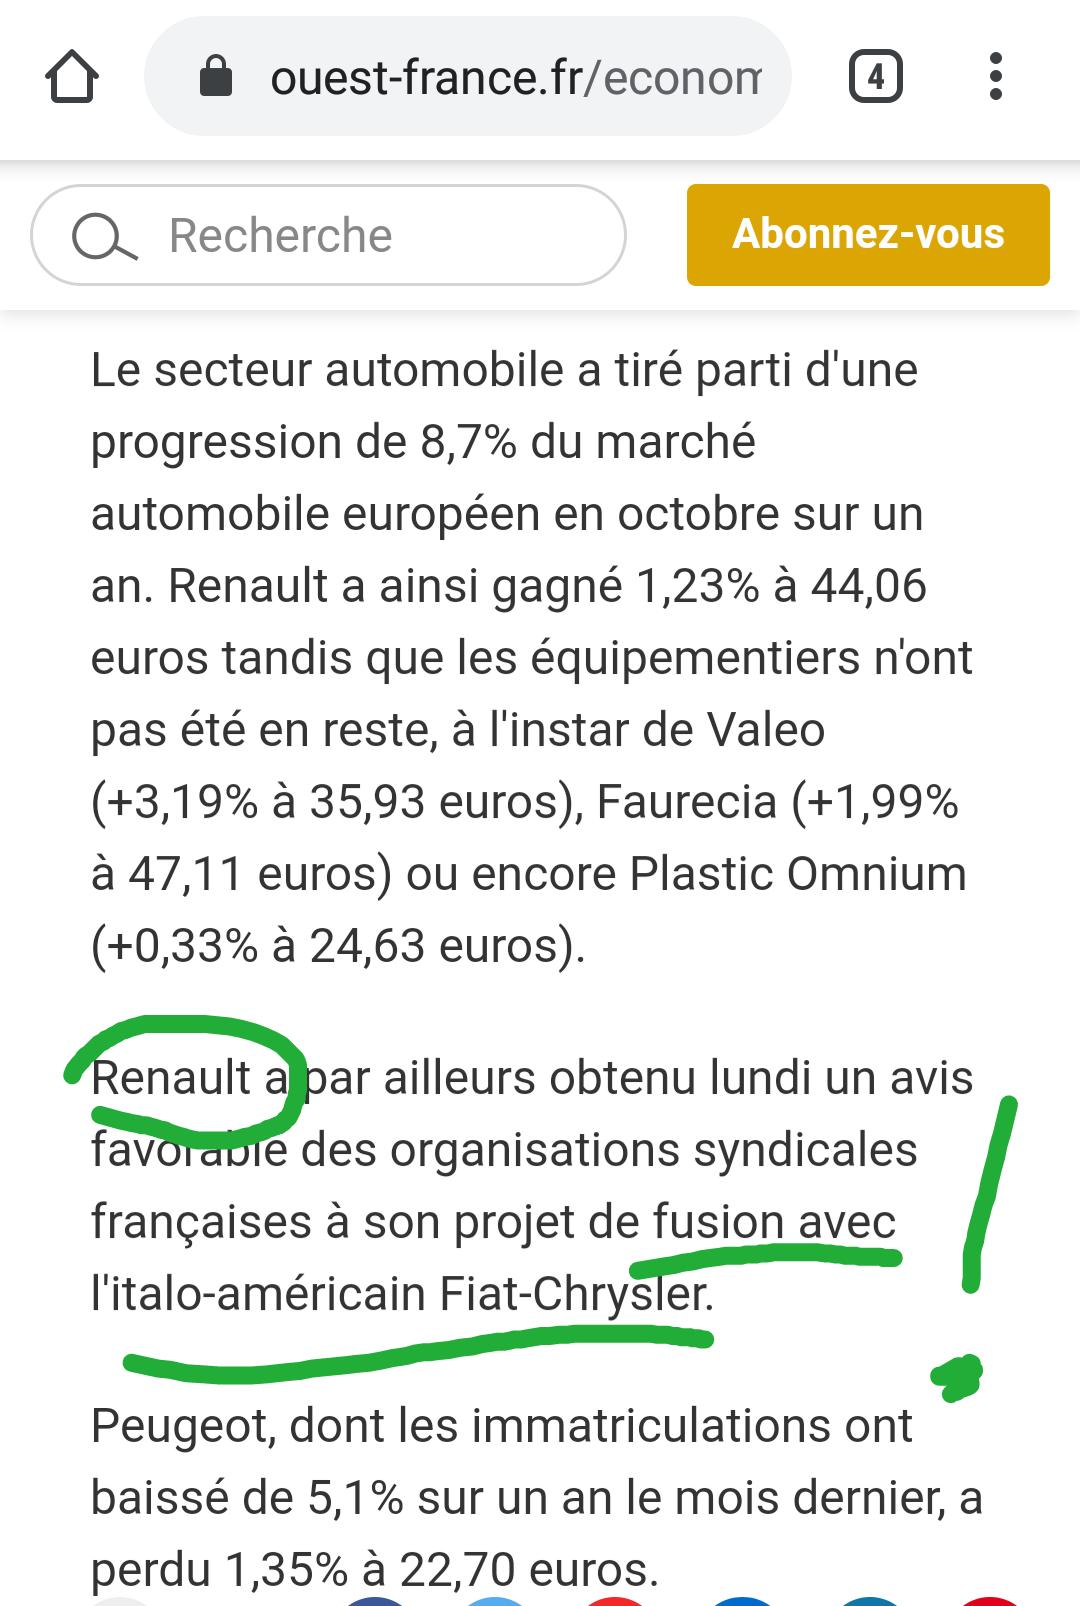 [Actualité] Alliance Renault-Nissan-Mitsubishi - Page 14 Img_2033